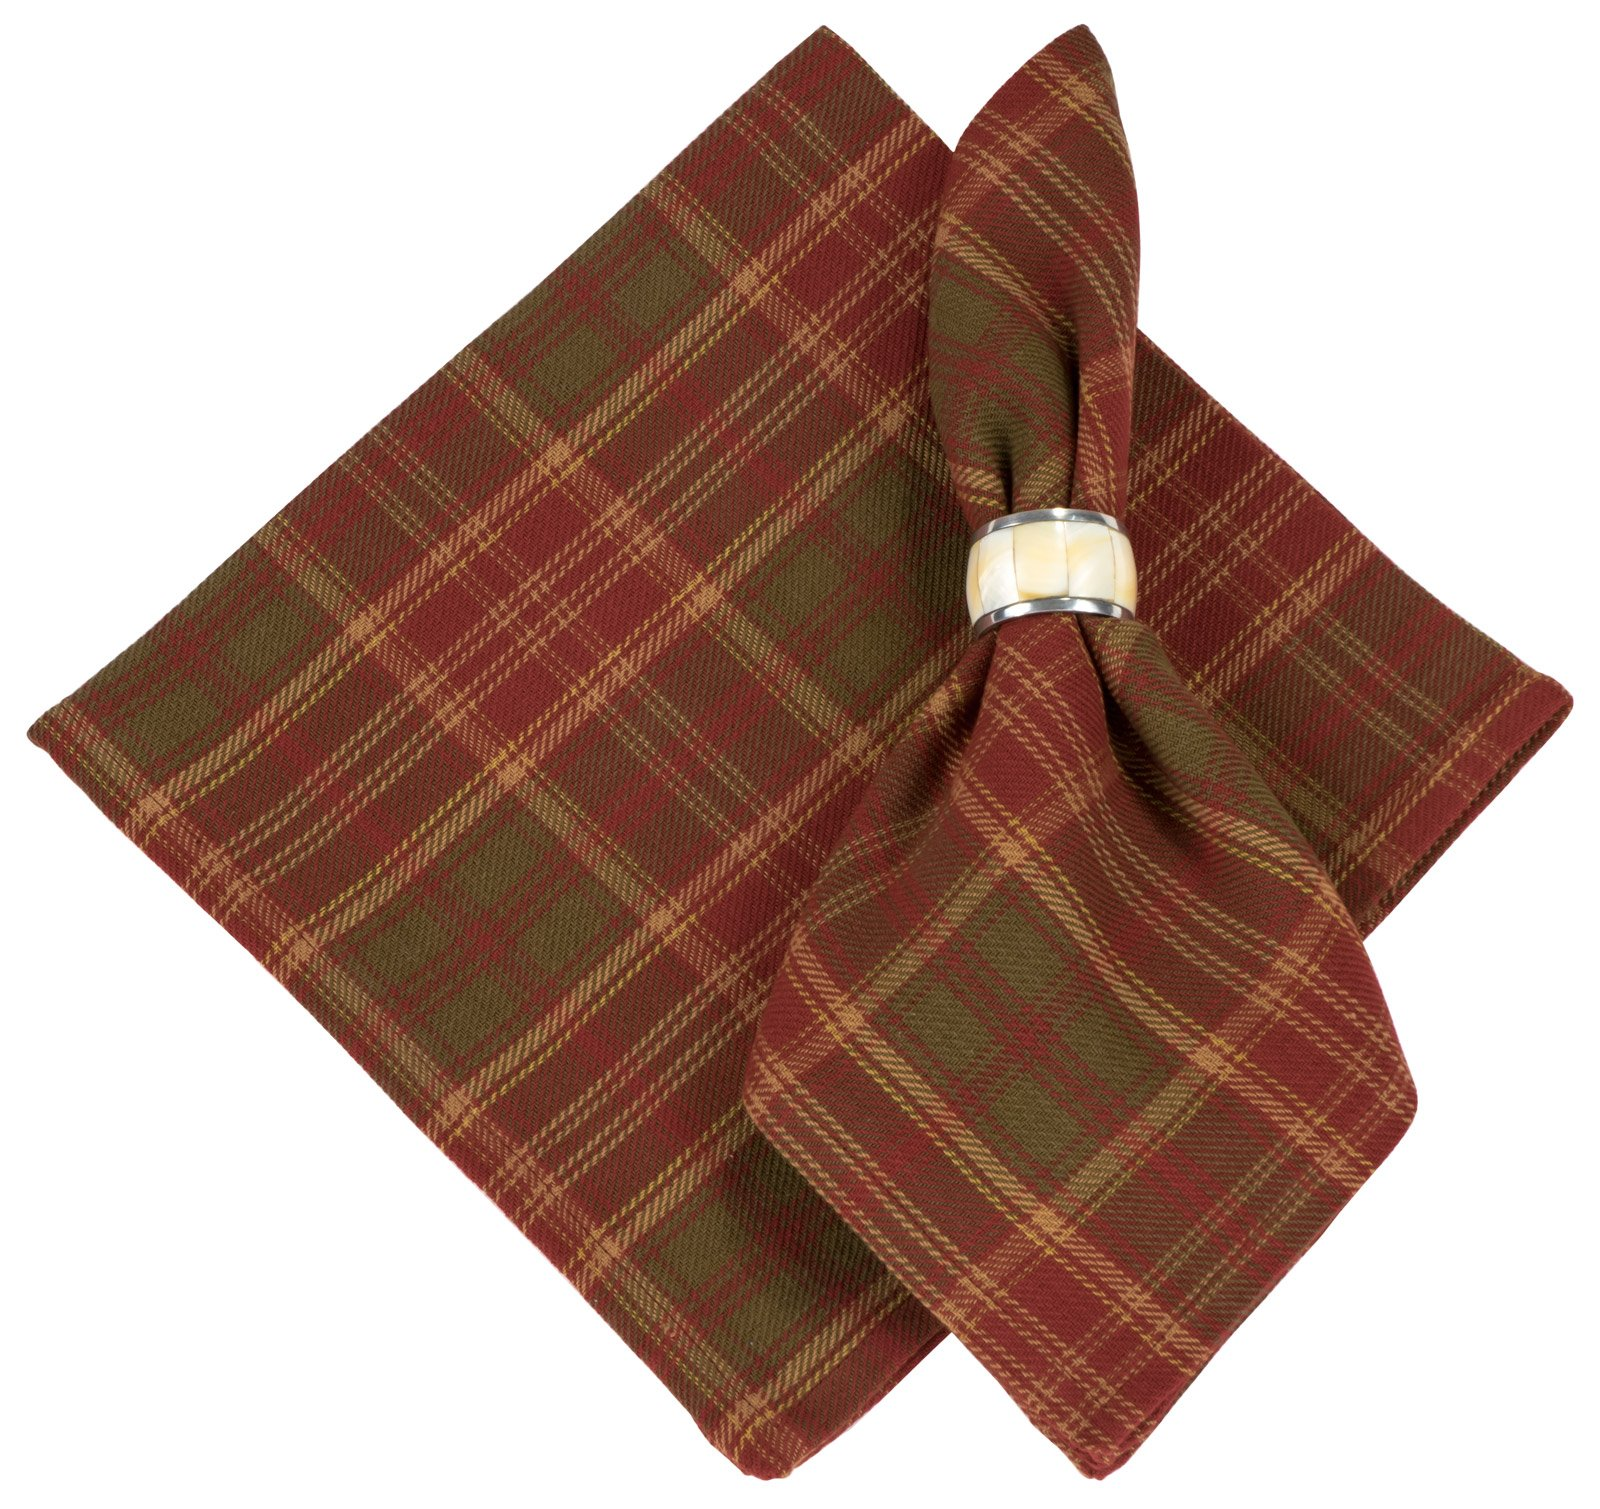 100% Cotton Red & Green Plaid 22''x22'' Napkin, Set of 6 - Pineberry